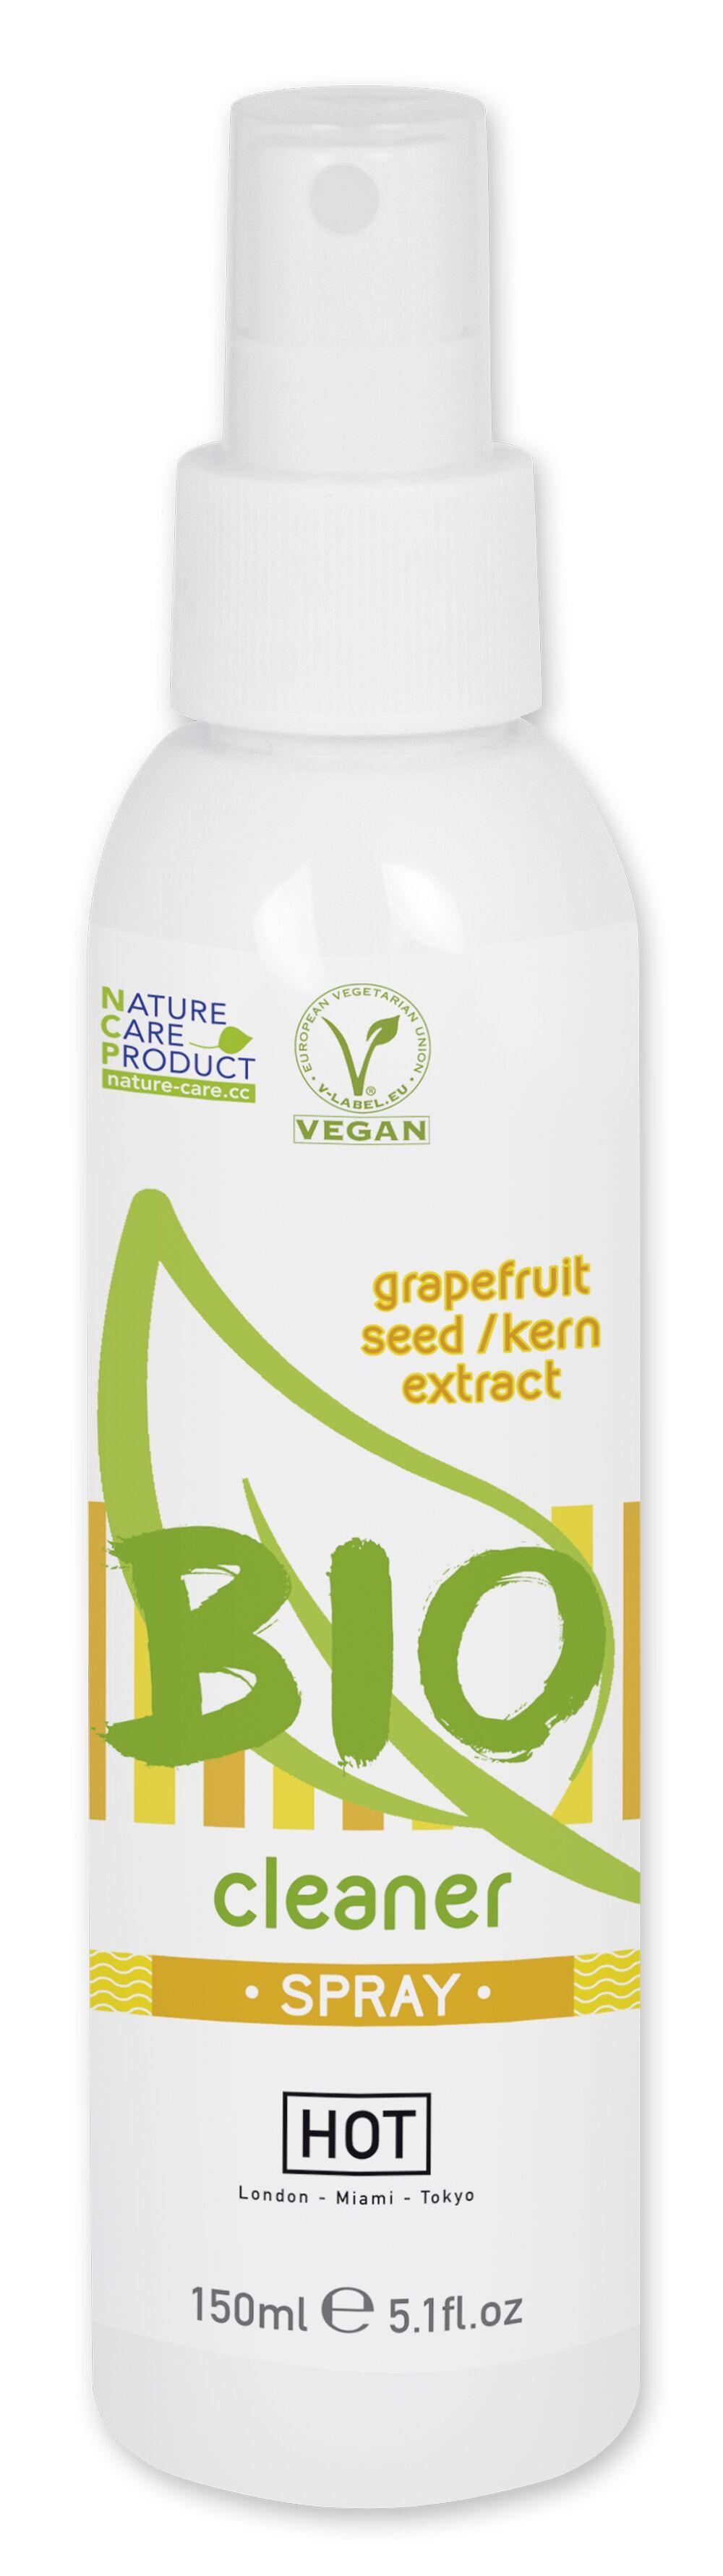 HOT Spray Nettoyant Bio 150 ml